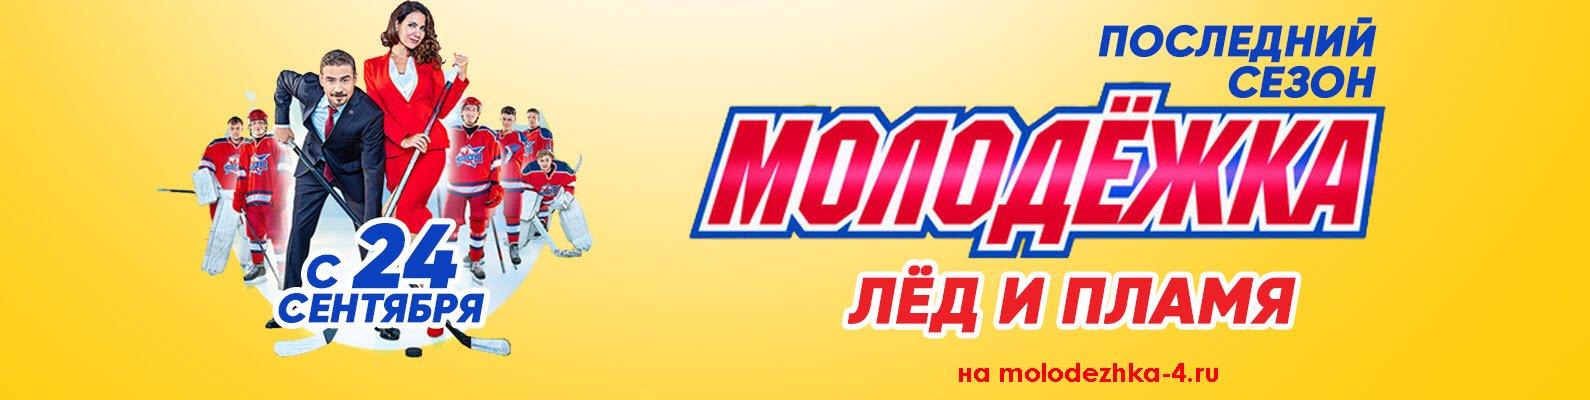 Сериал Молодежка 6  сезон (Лед и Пламя) смотреть онлайн 2018